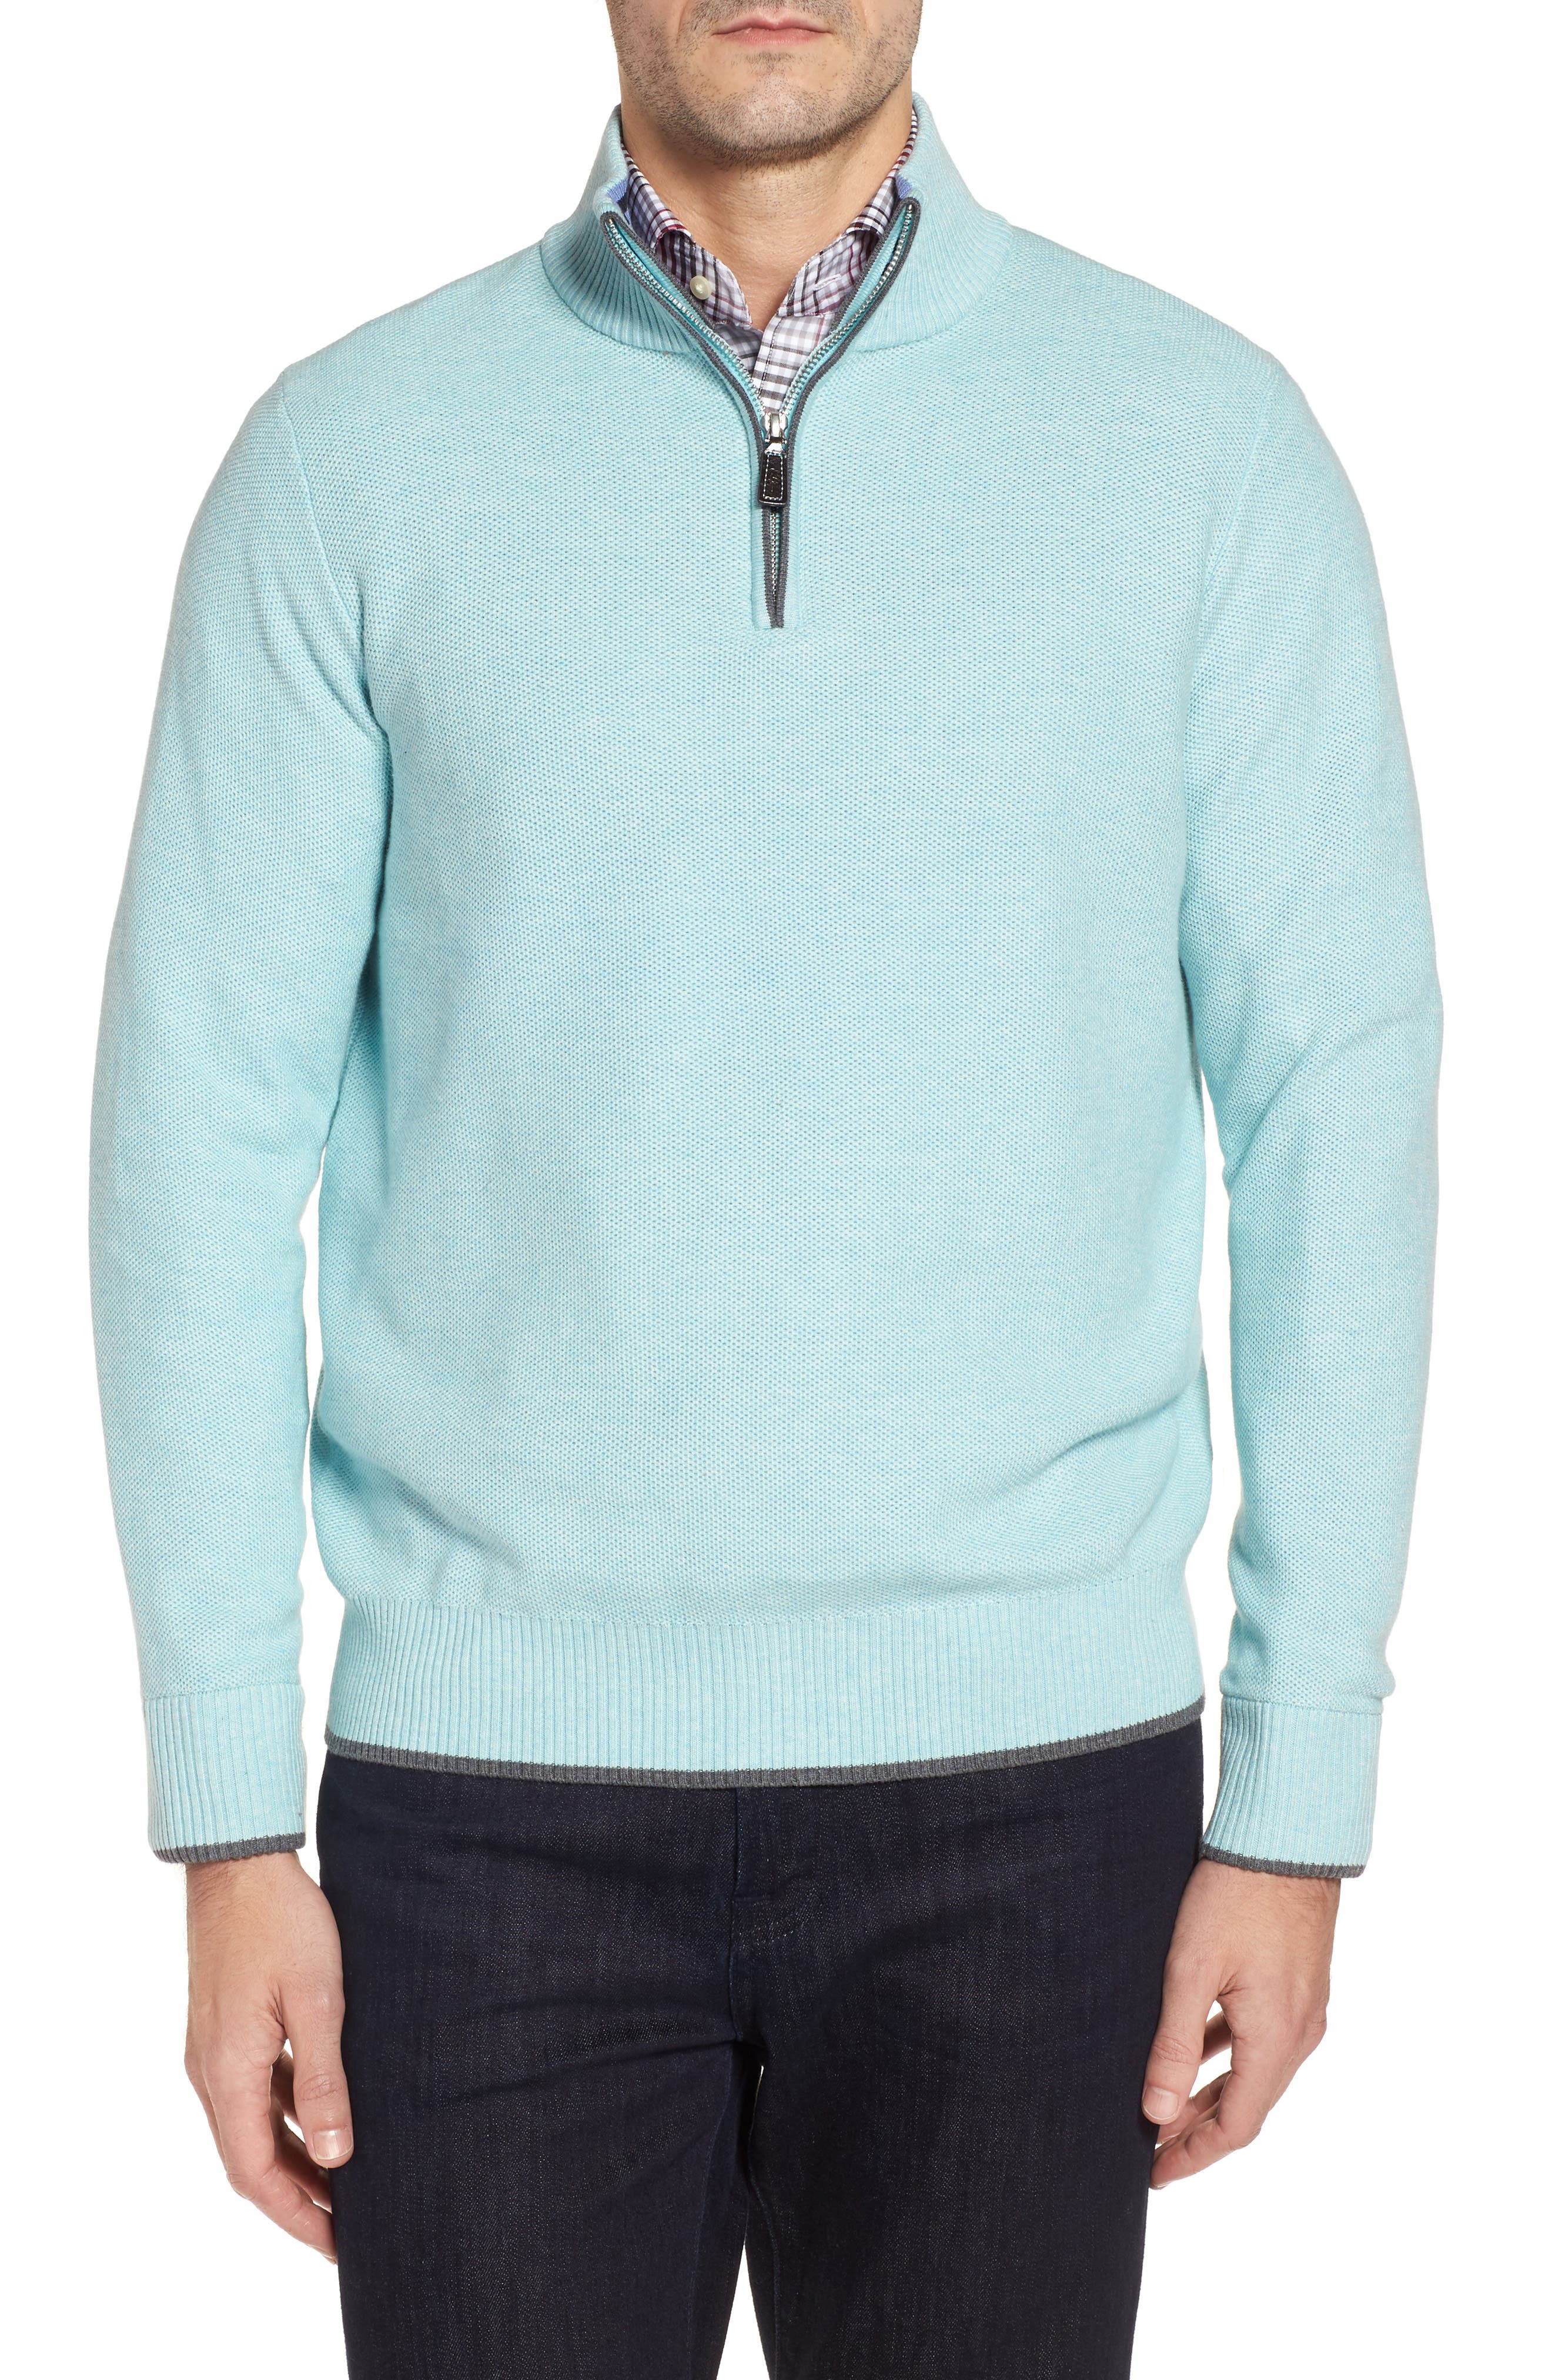 Starks Tipped Quarter Zip Sweater,                             Main thumbnail 1, color,                             Aqua